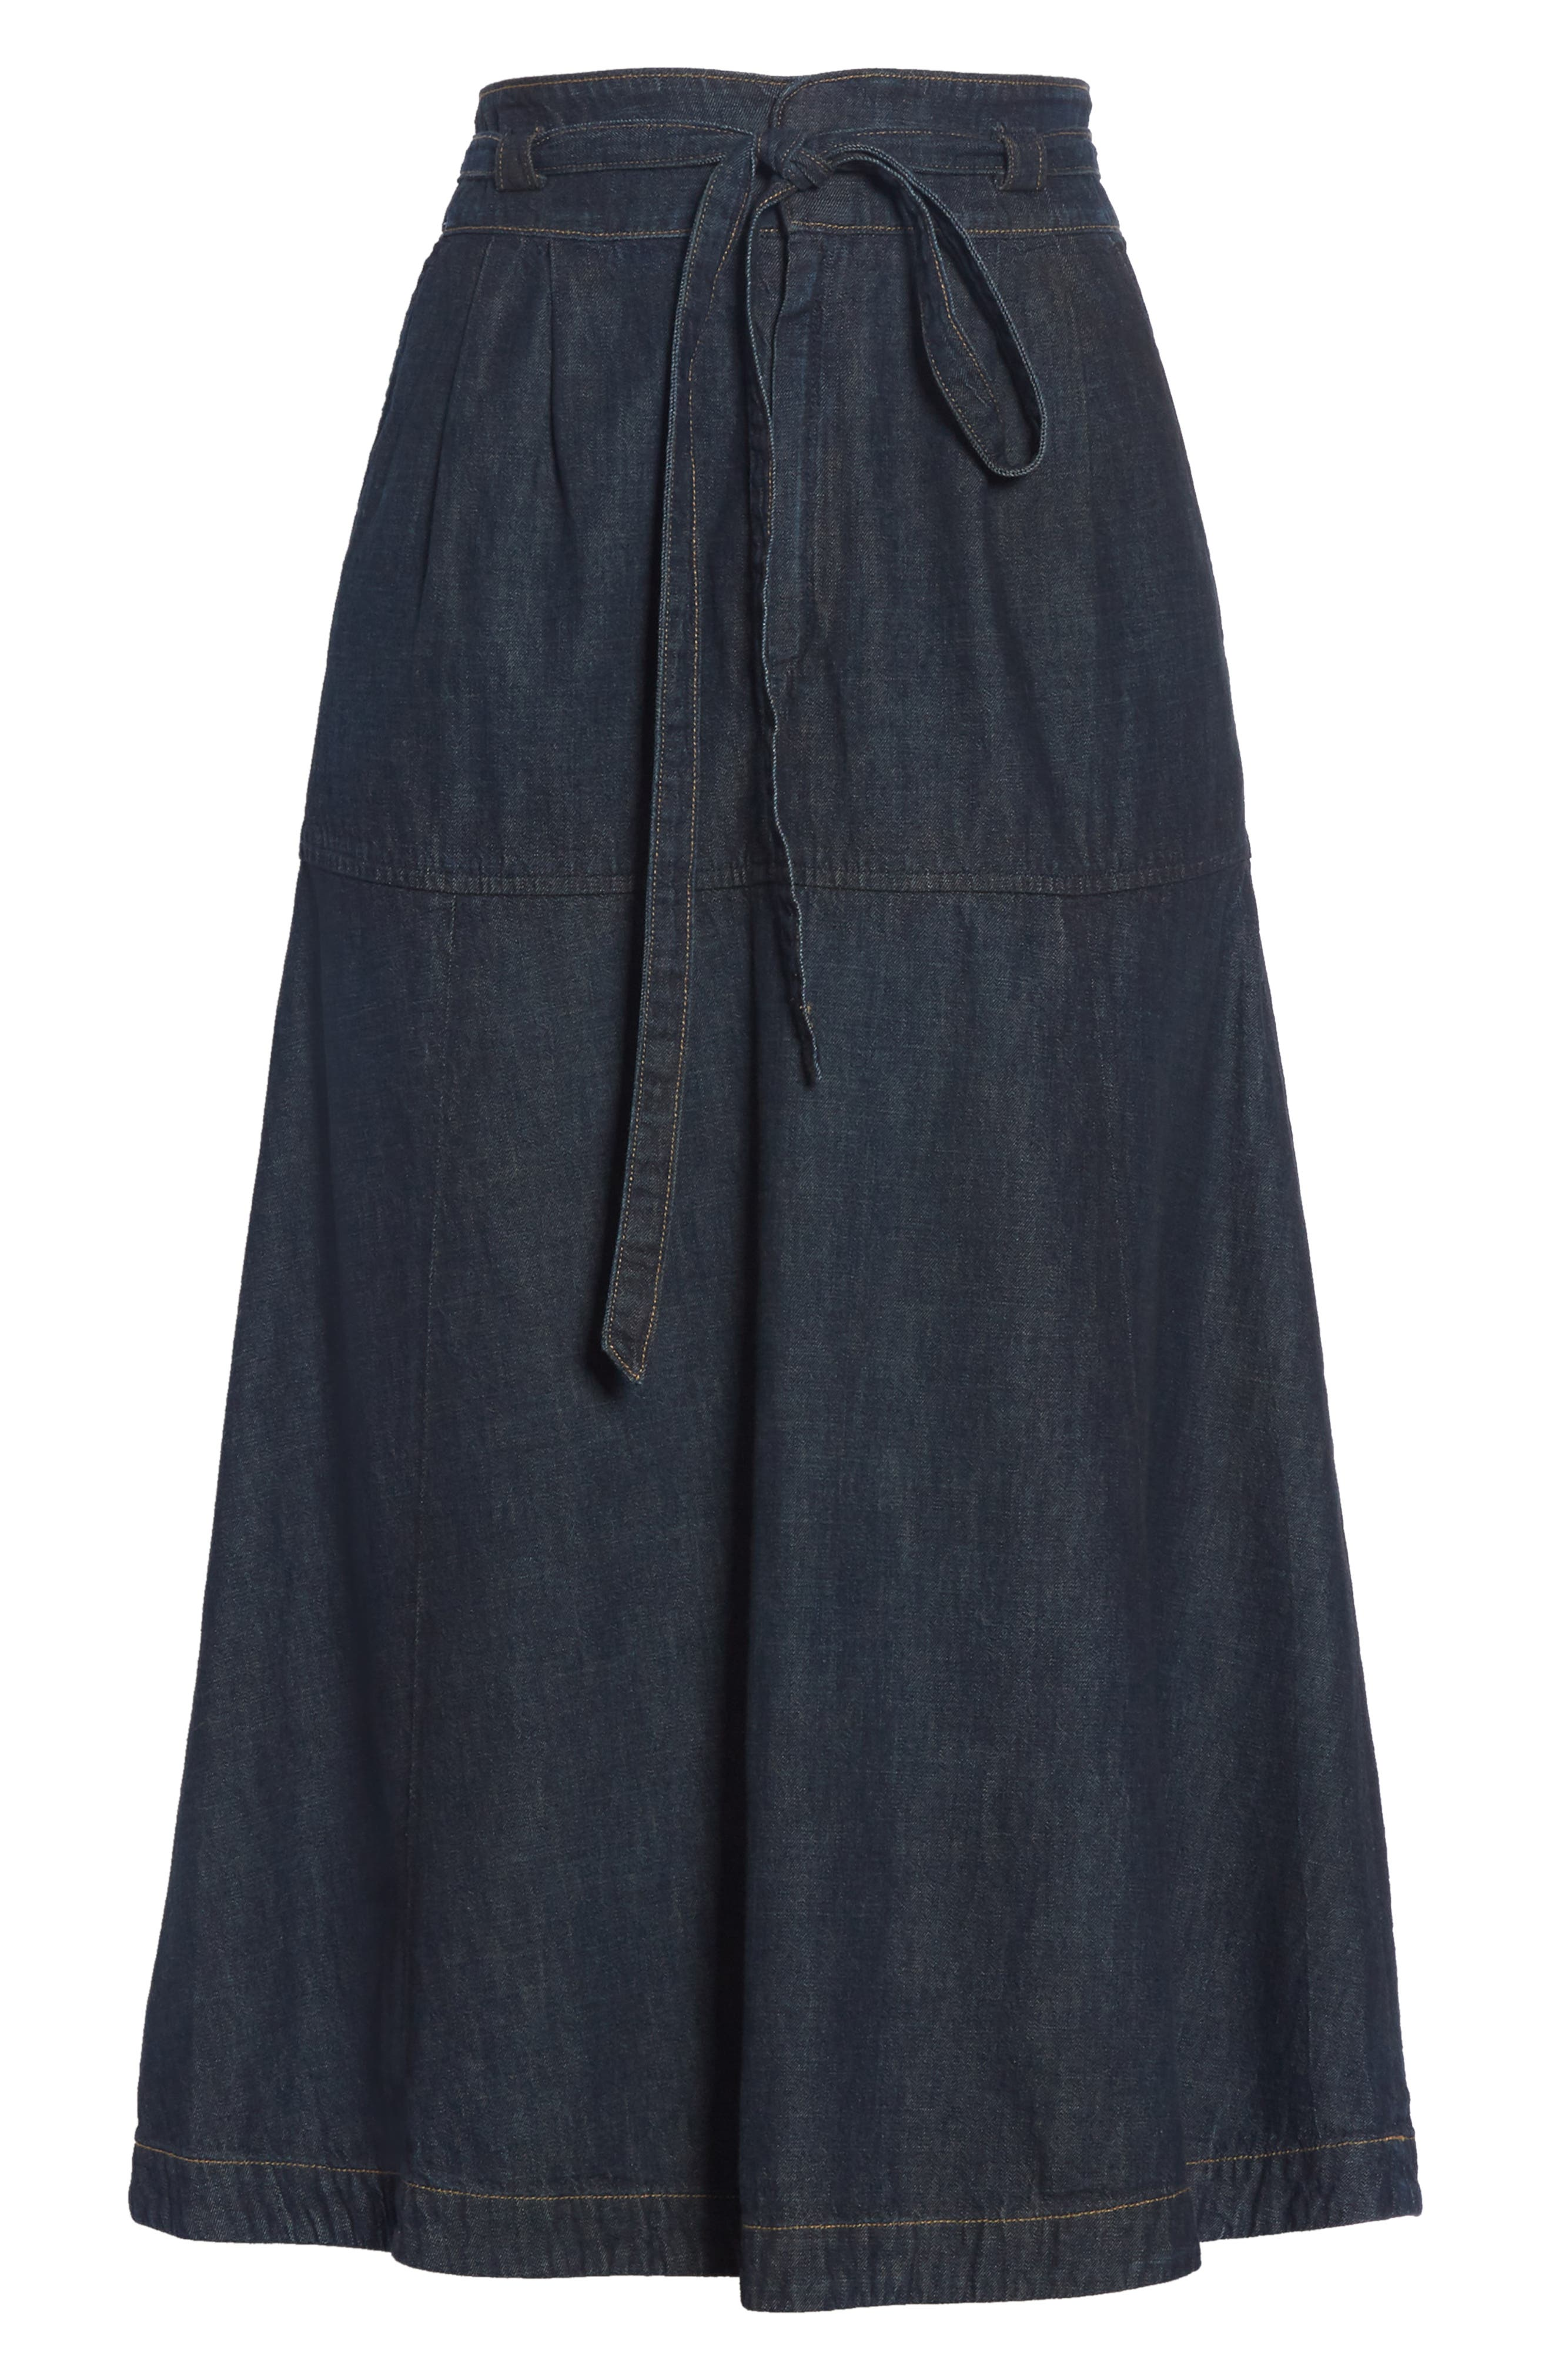 Denim Midi Skirt,                             Alternate thumbnail 6, color,                             DARK INDIGO